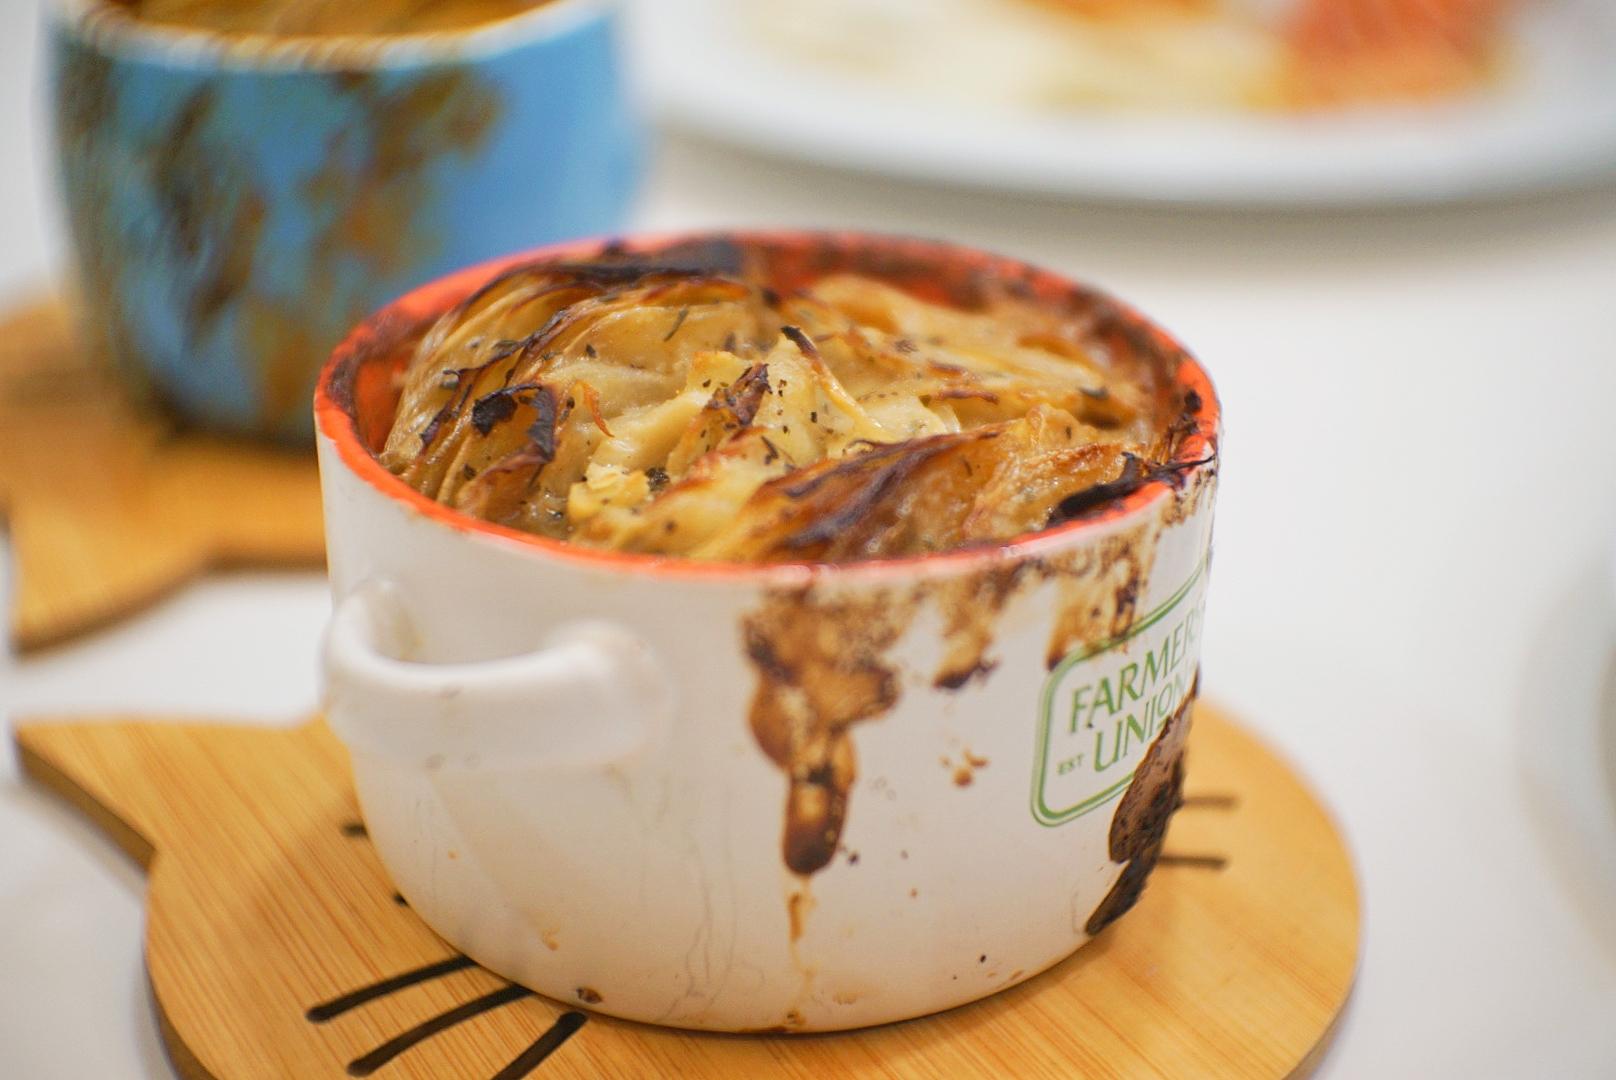 The potato gratin tastes exactly like how it looks - a savoury, creamy, guilty-pleasure.